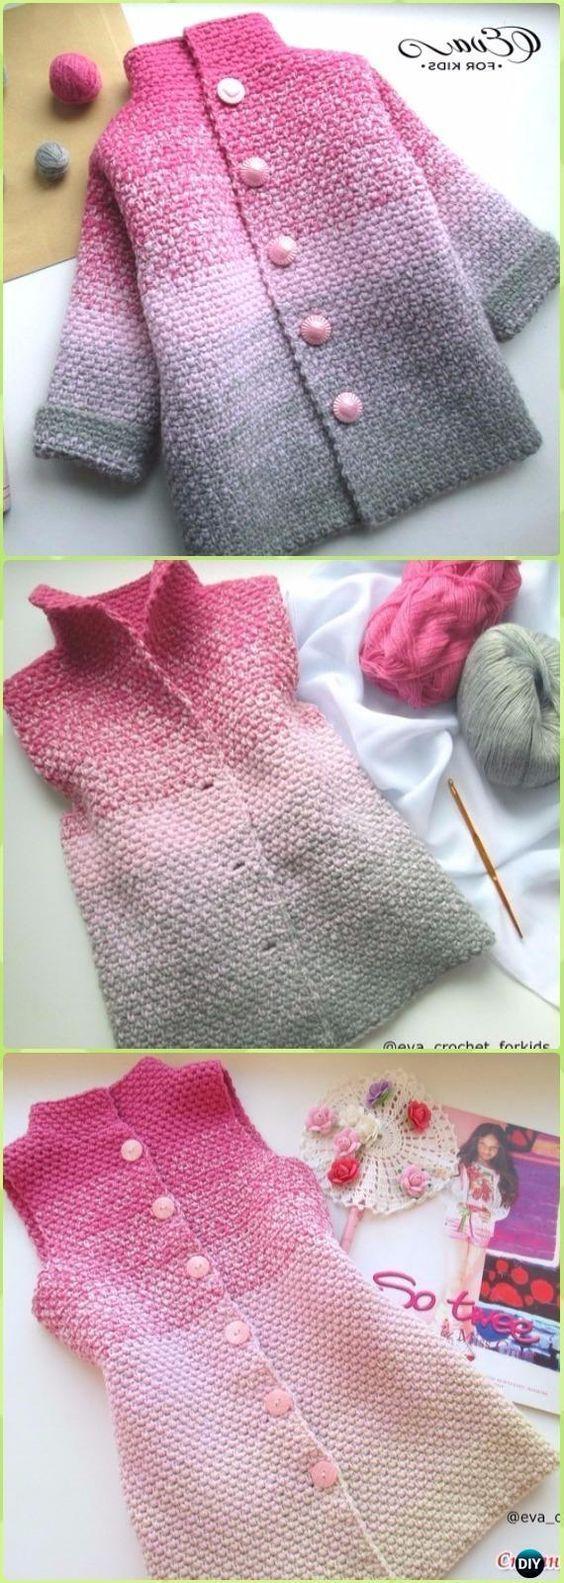 Crochet Glamorous Beauty Ombre Baby Cardigan Free Pattern